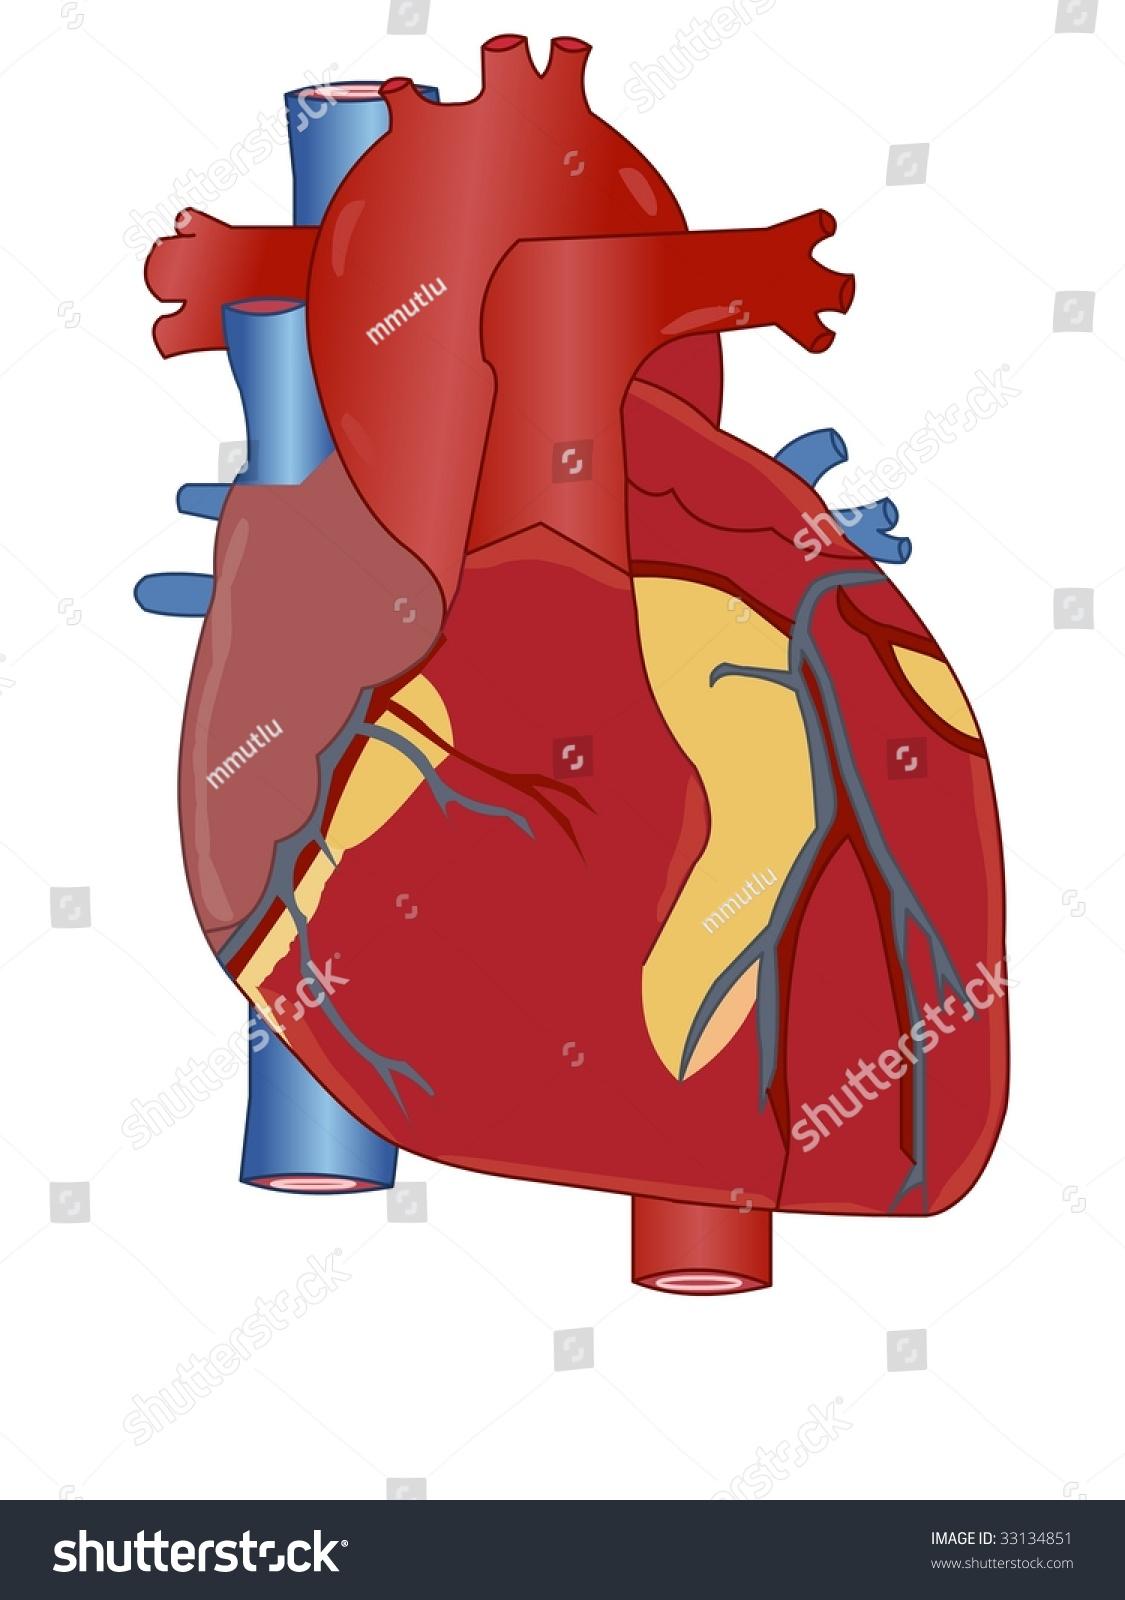 Reptile Heart Anatomy 3872717 Follow4morefo